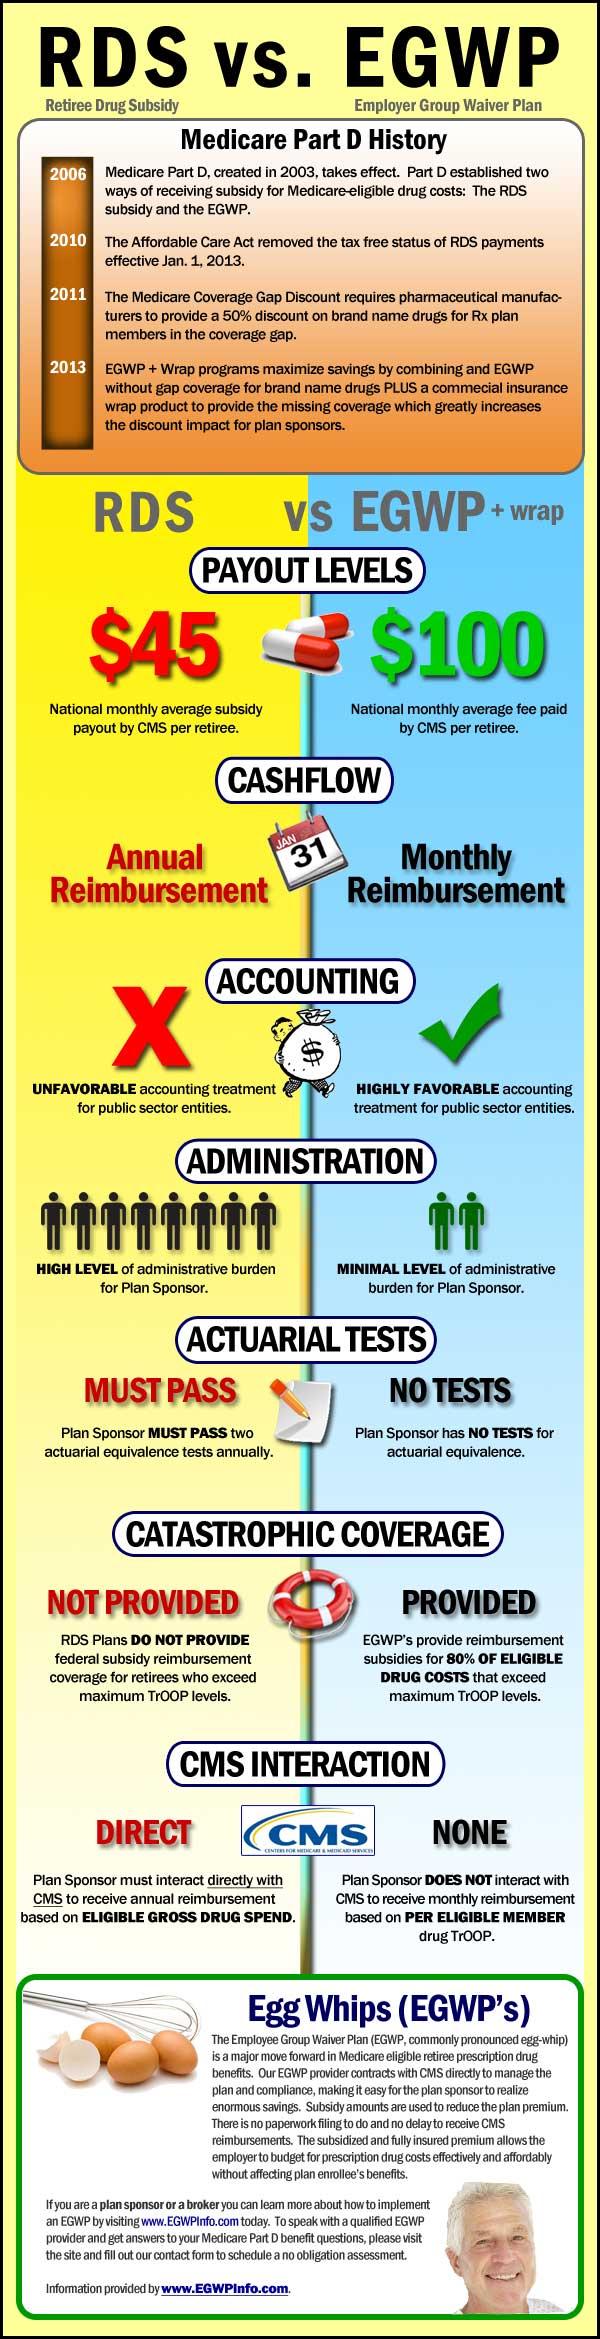 Rds-Vs-Egwp-Infographic